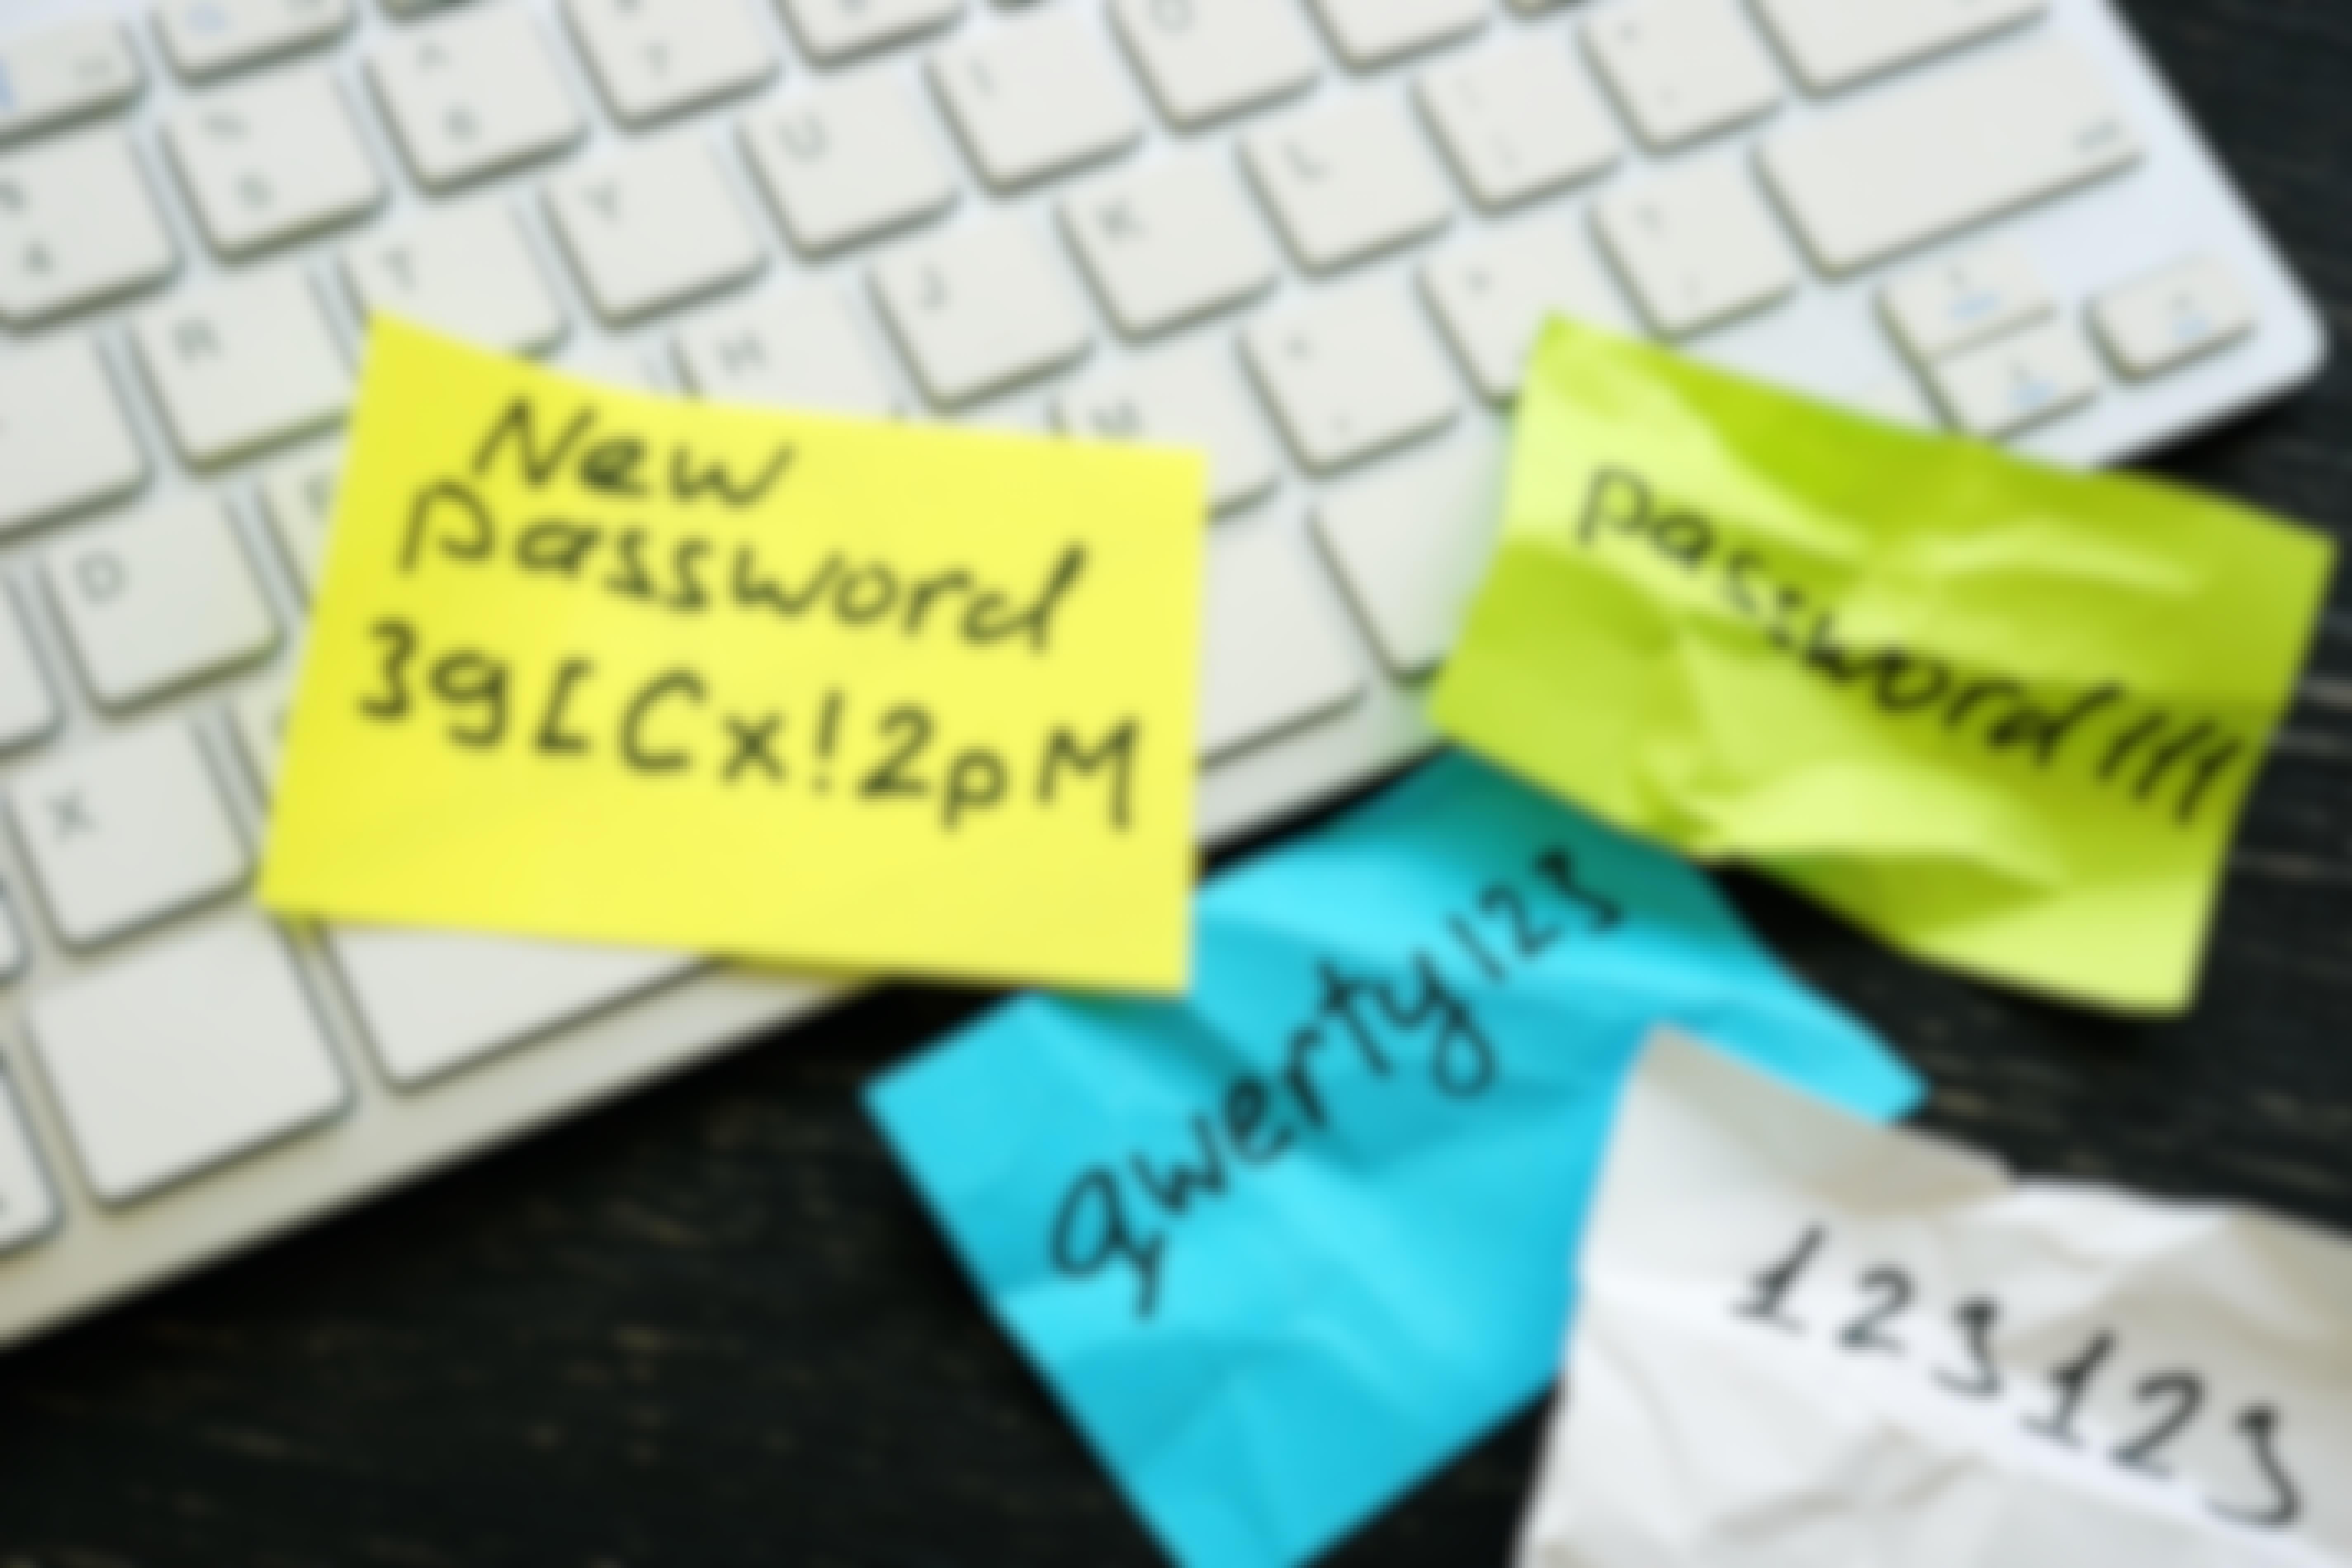 OBS! Ändra lösenord